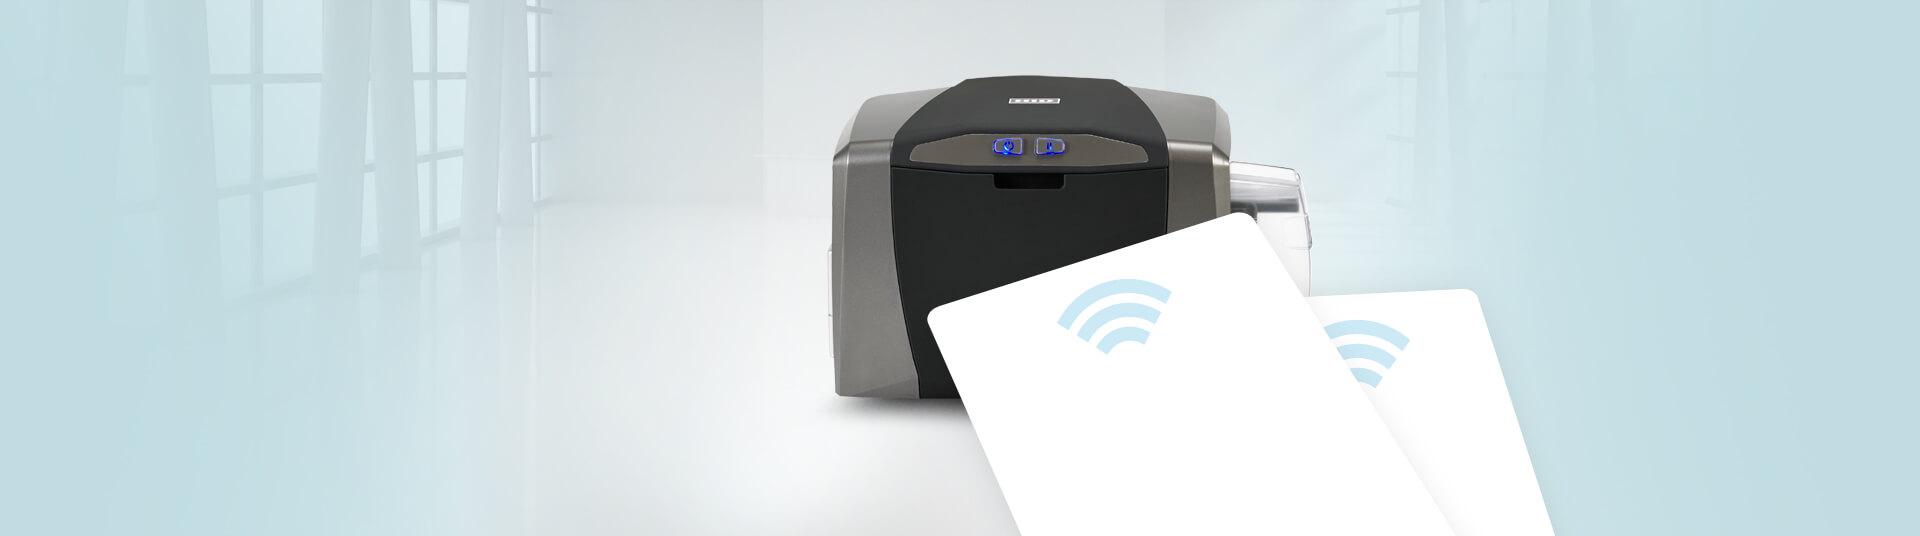 Proximity RFID Card Printers